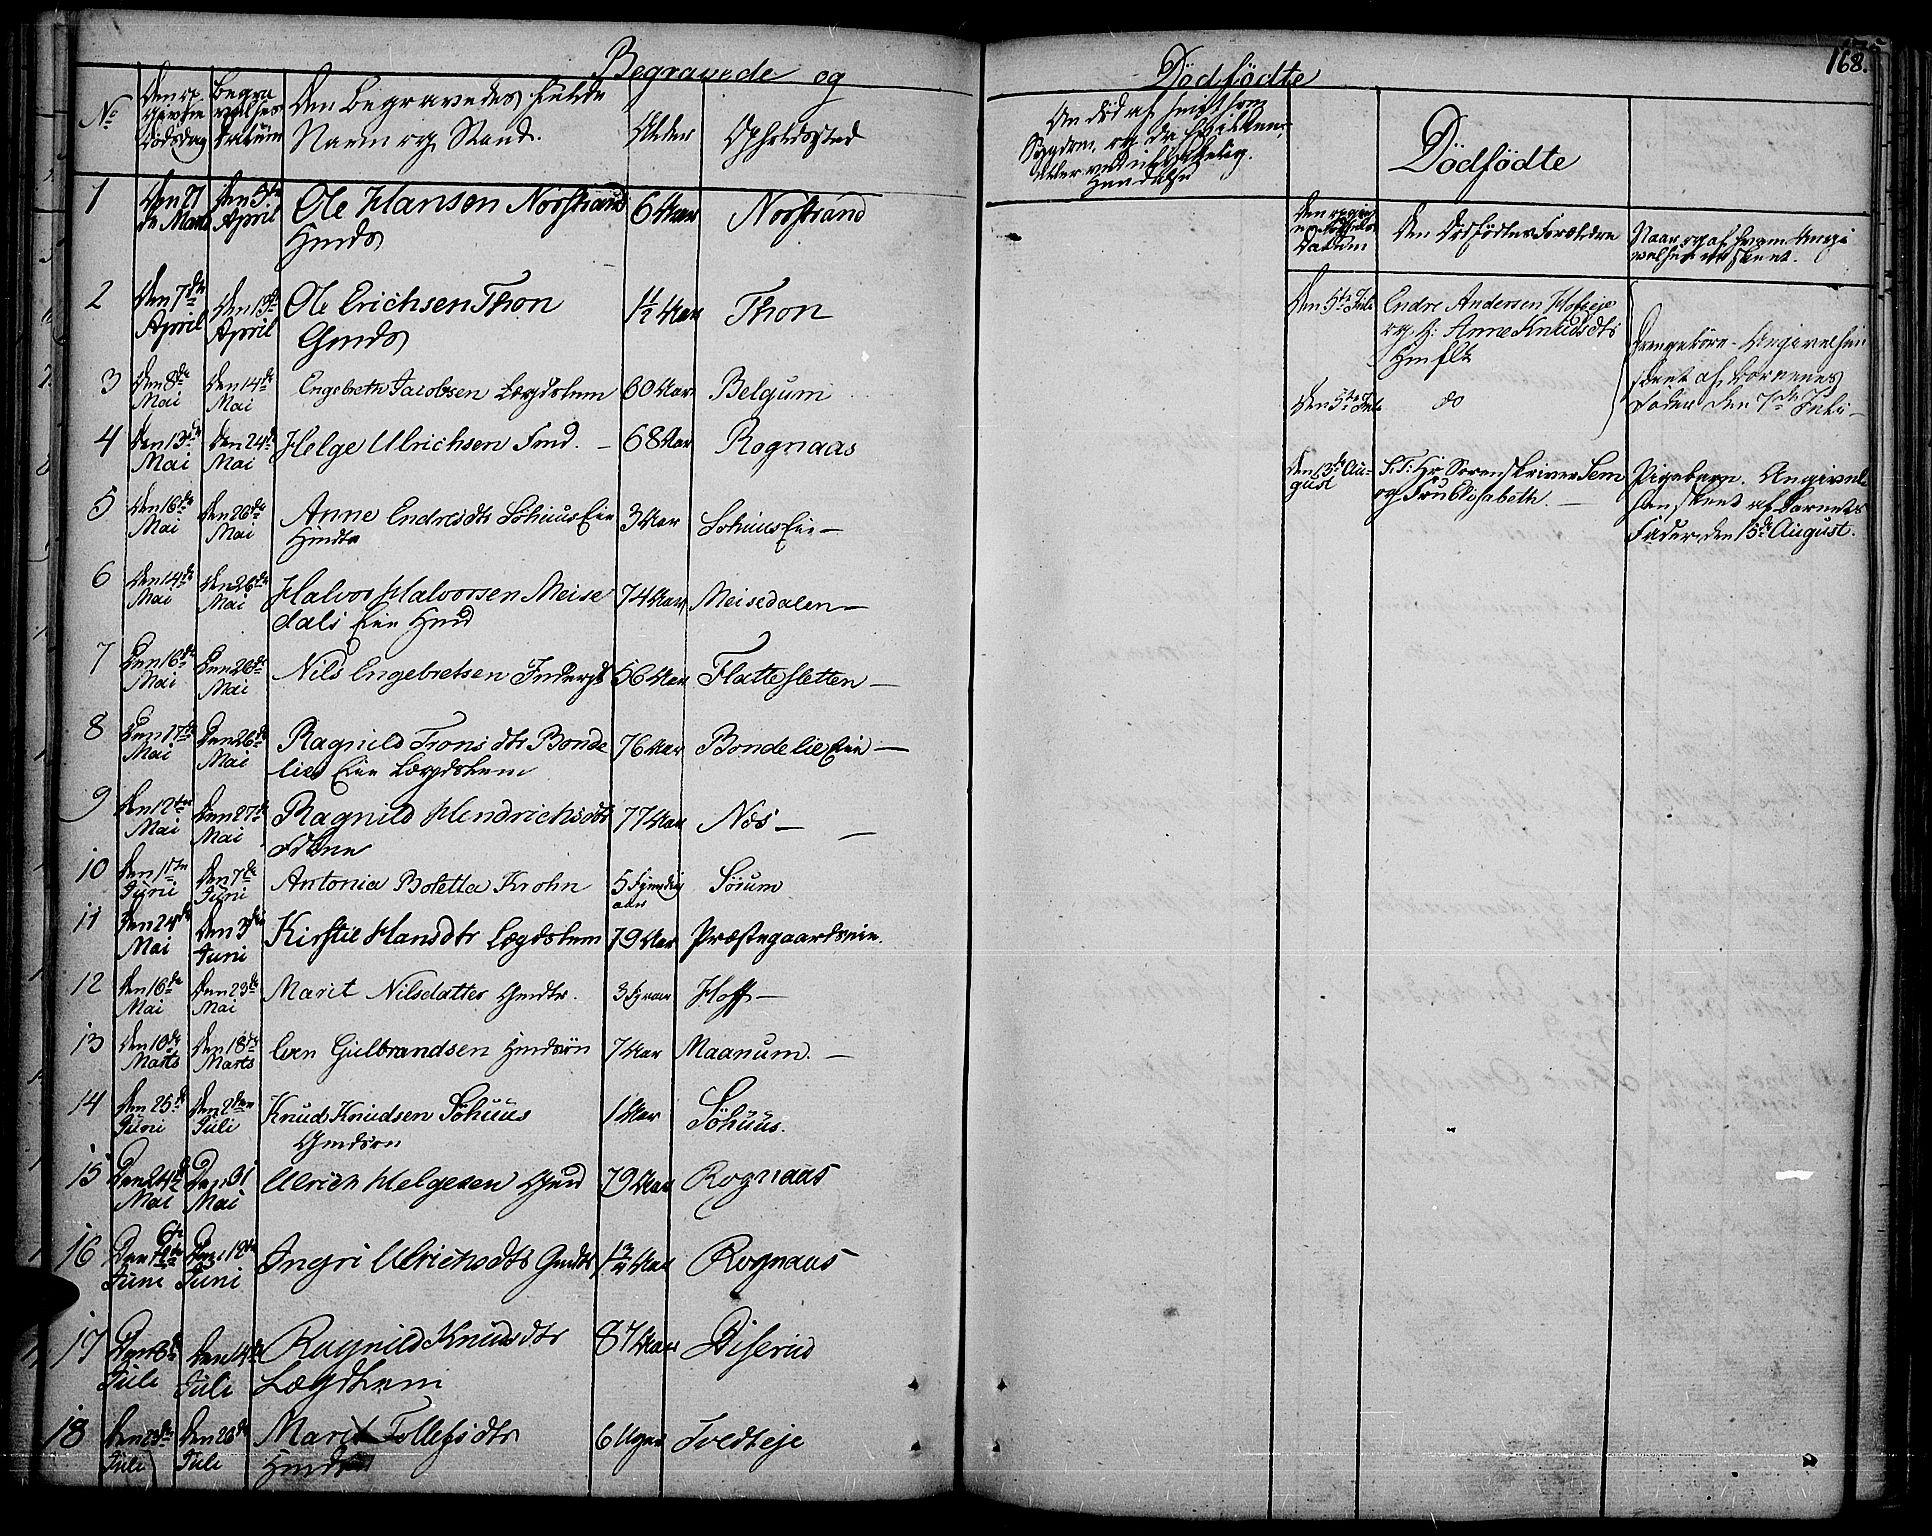 SAH, Nord-Aurdal prestekontor, Ministerialbok nr. 3, 1828-1841, s. 168